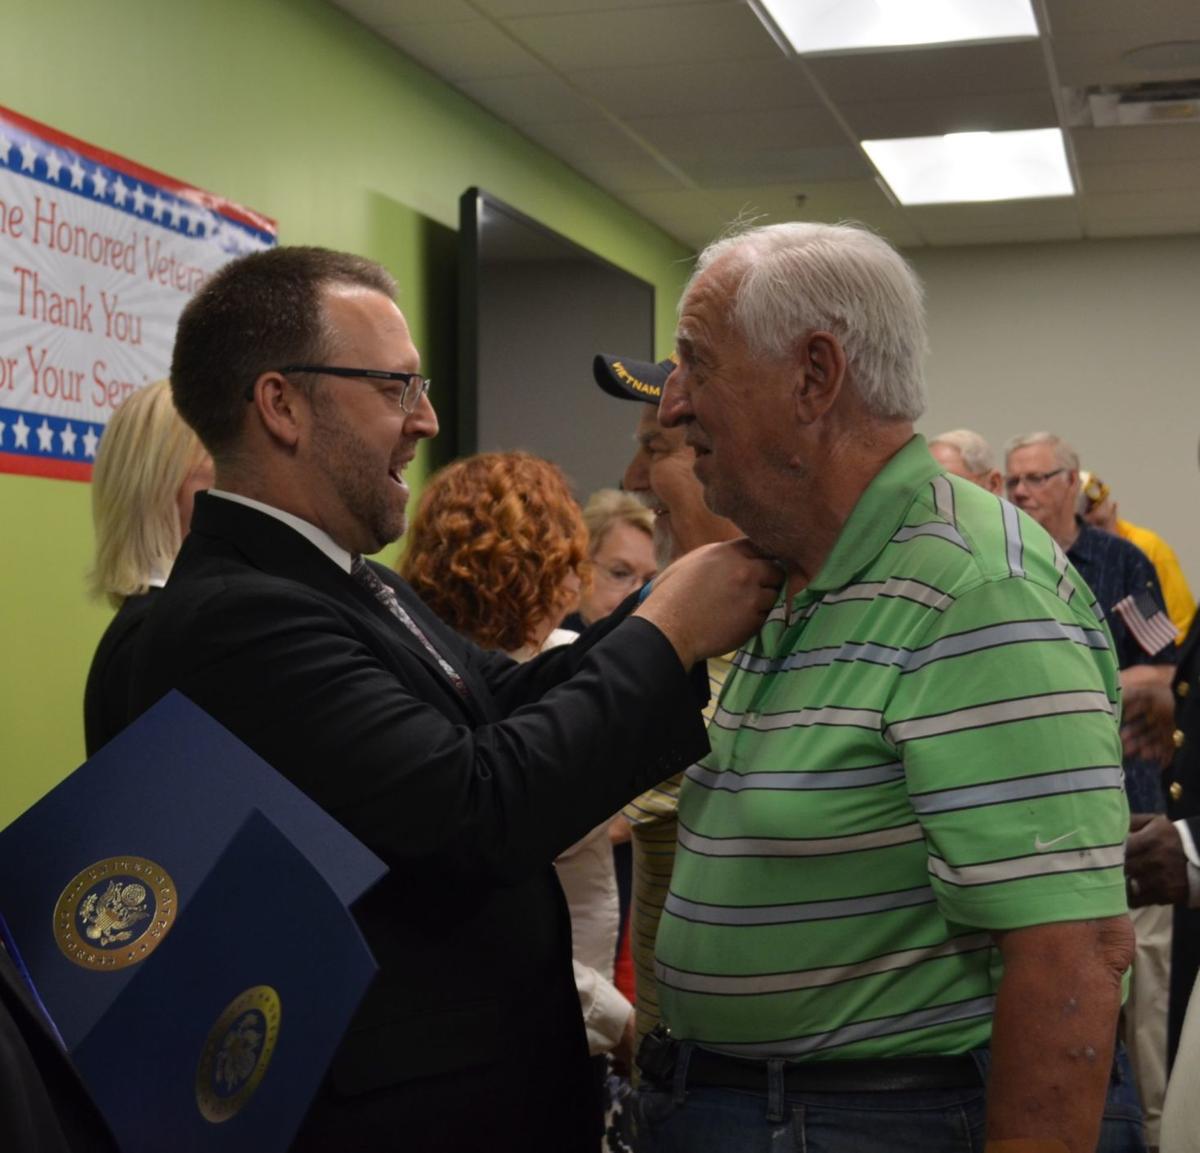 Vietnam War Commemoration Veterans Pinning Ceremony Hosted by Humana